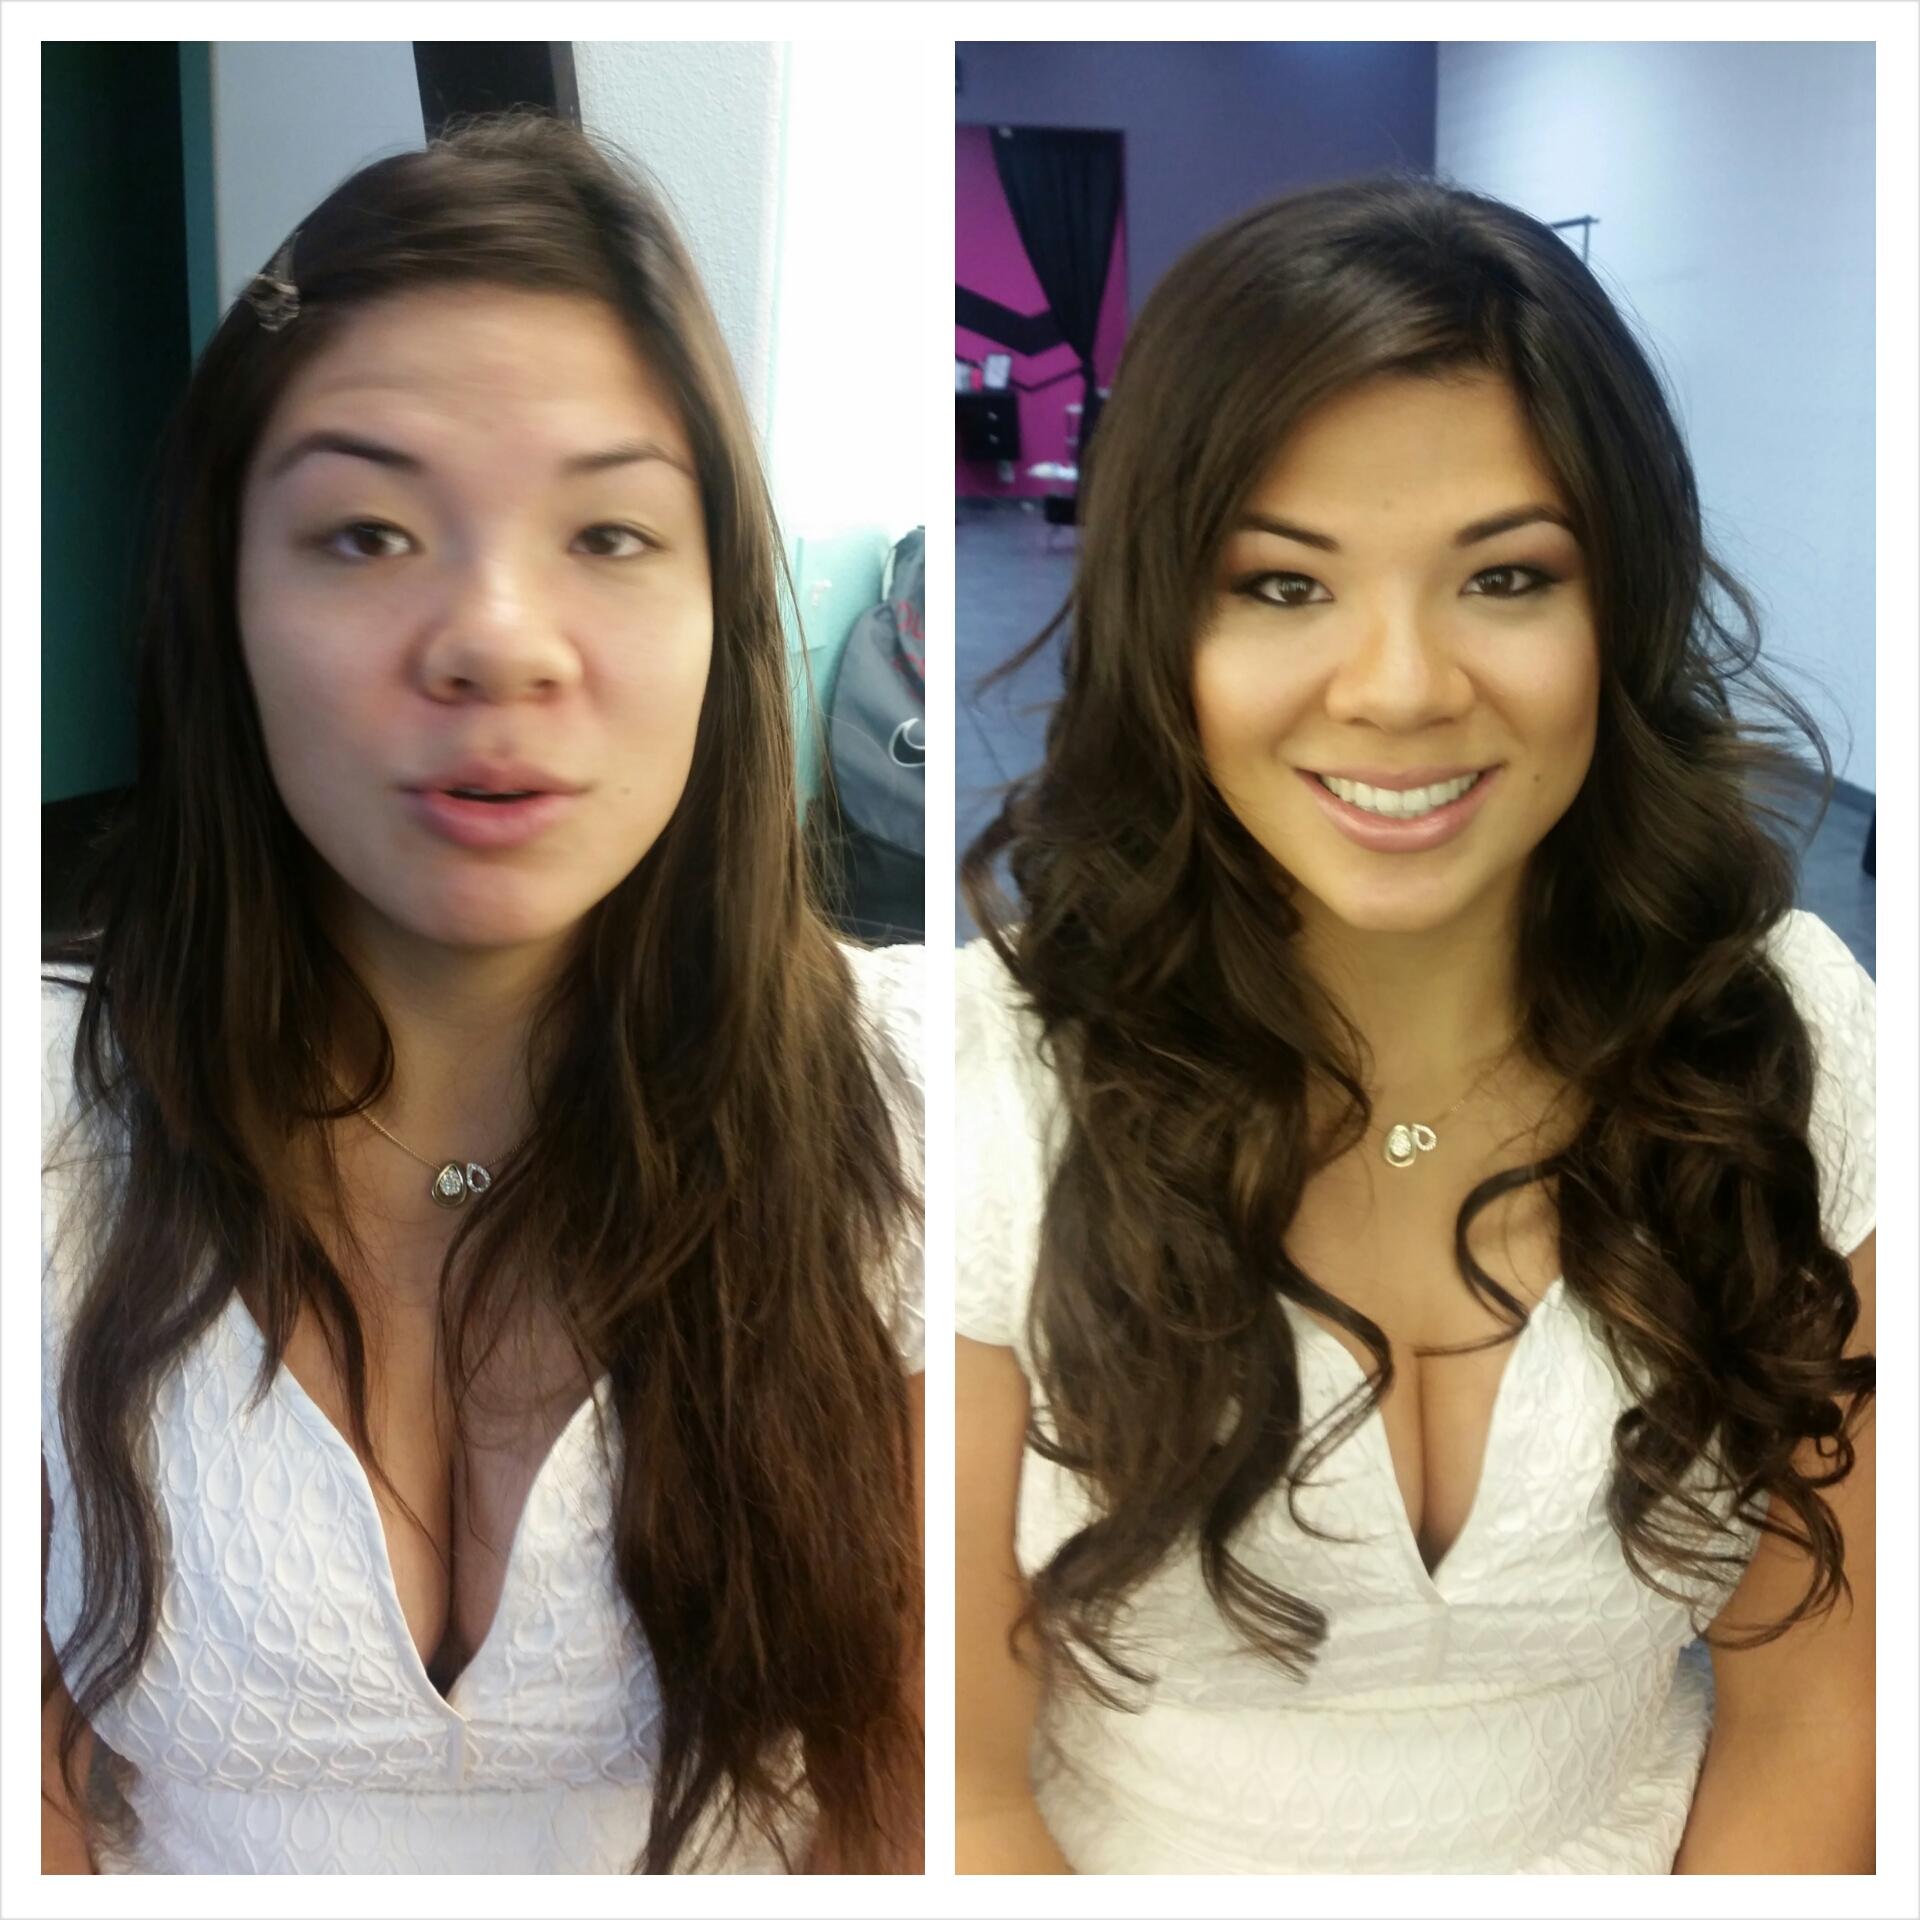 Long down hairstyle and natural makeup